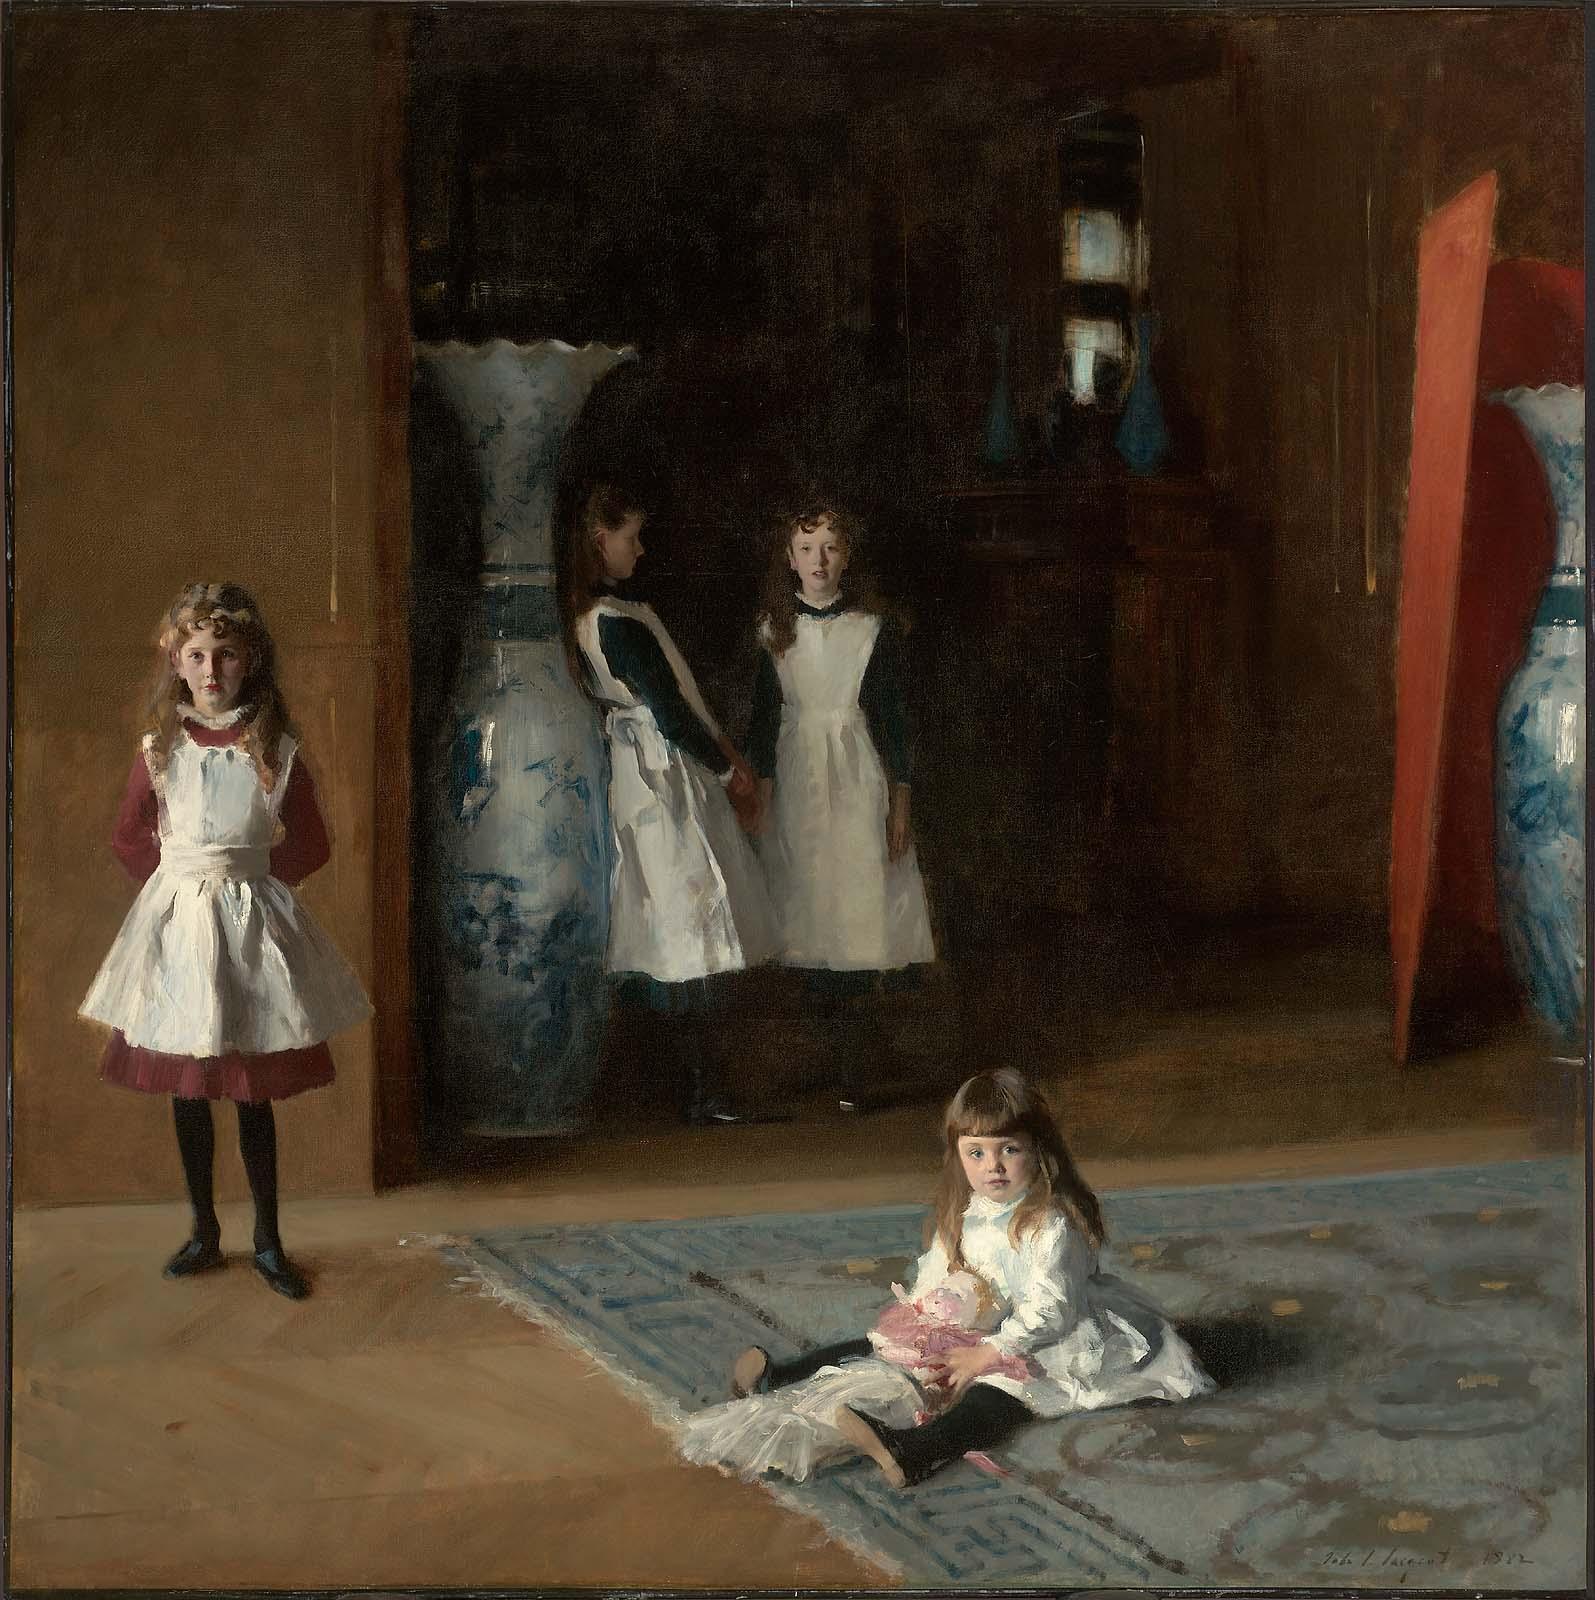 John Singer Sargent,  Daughters of Edward Darley Boit  (1882)